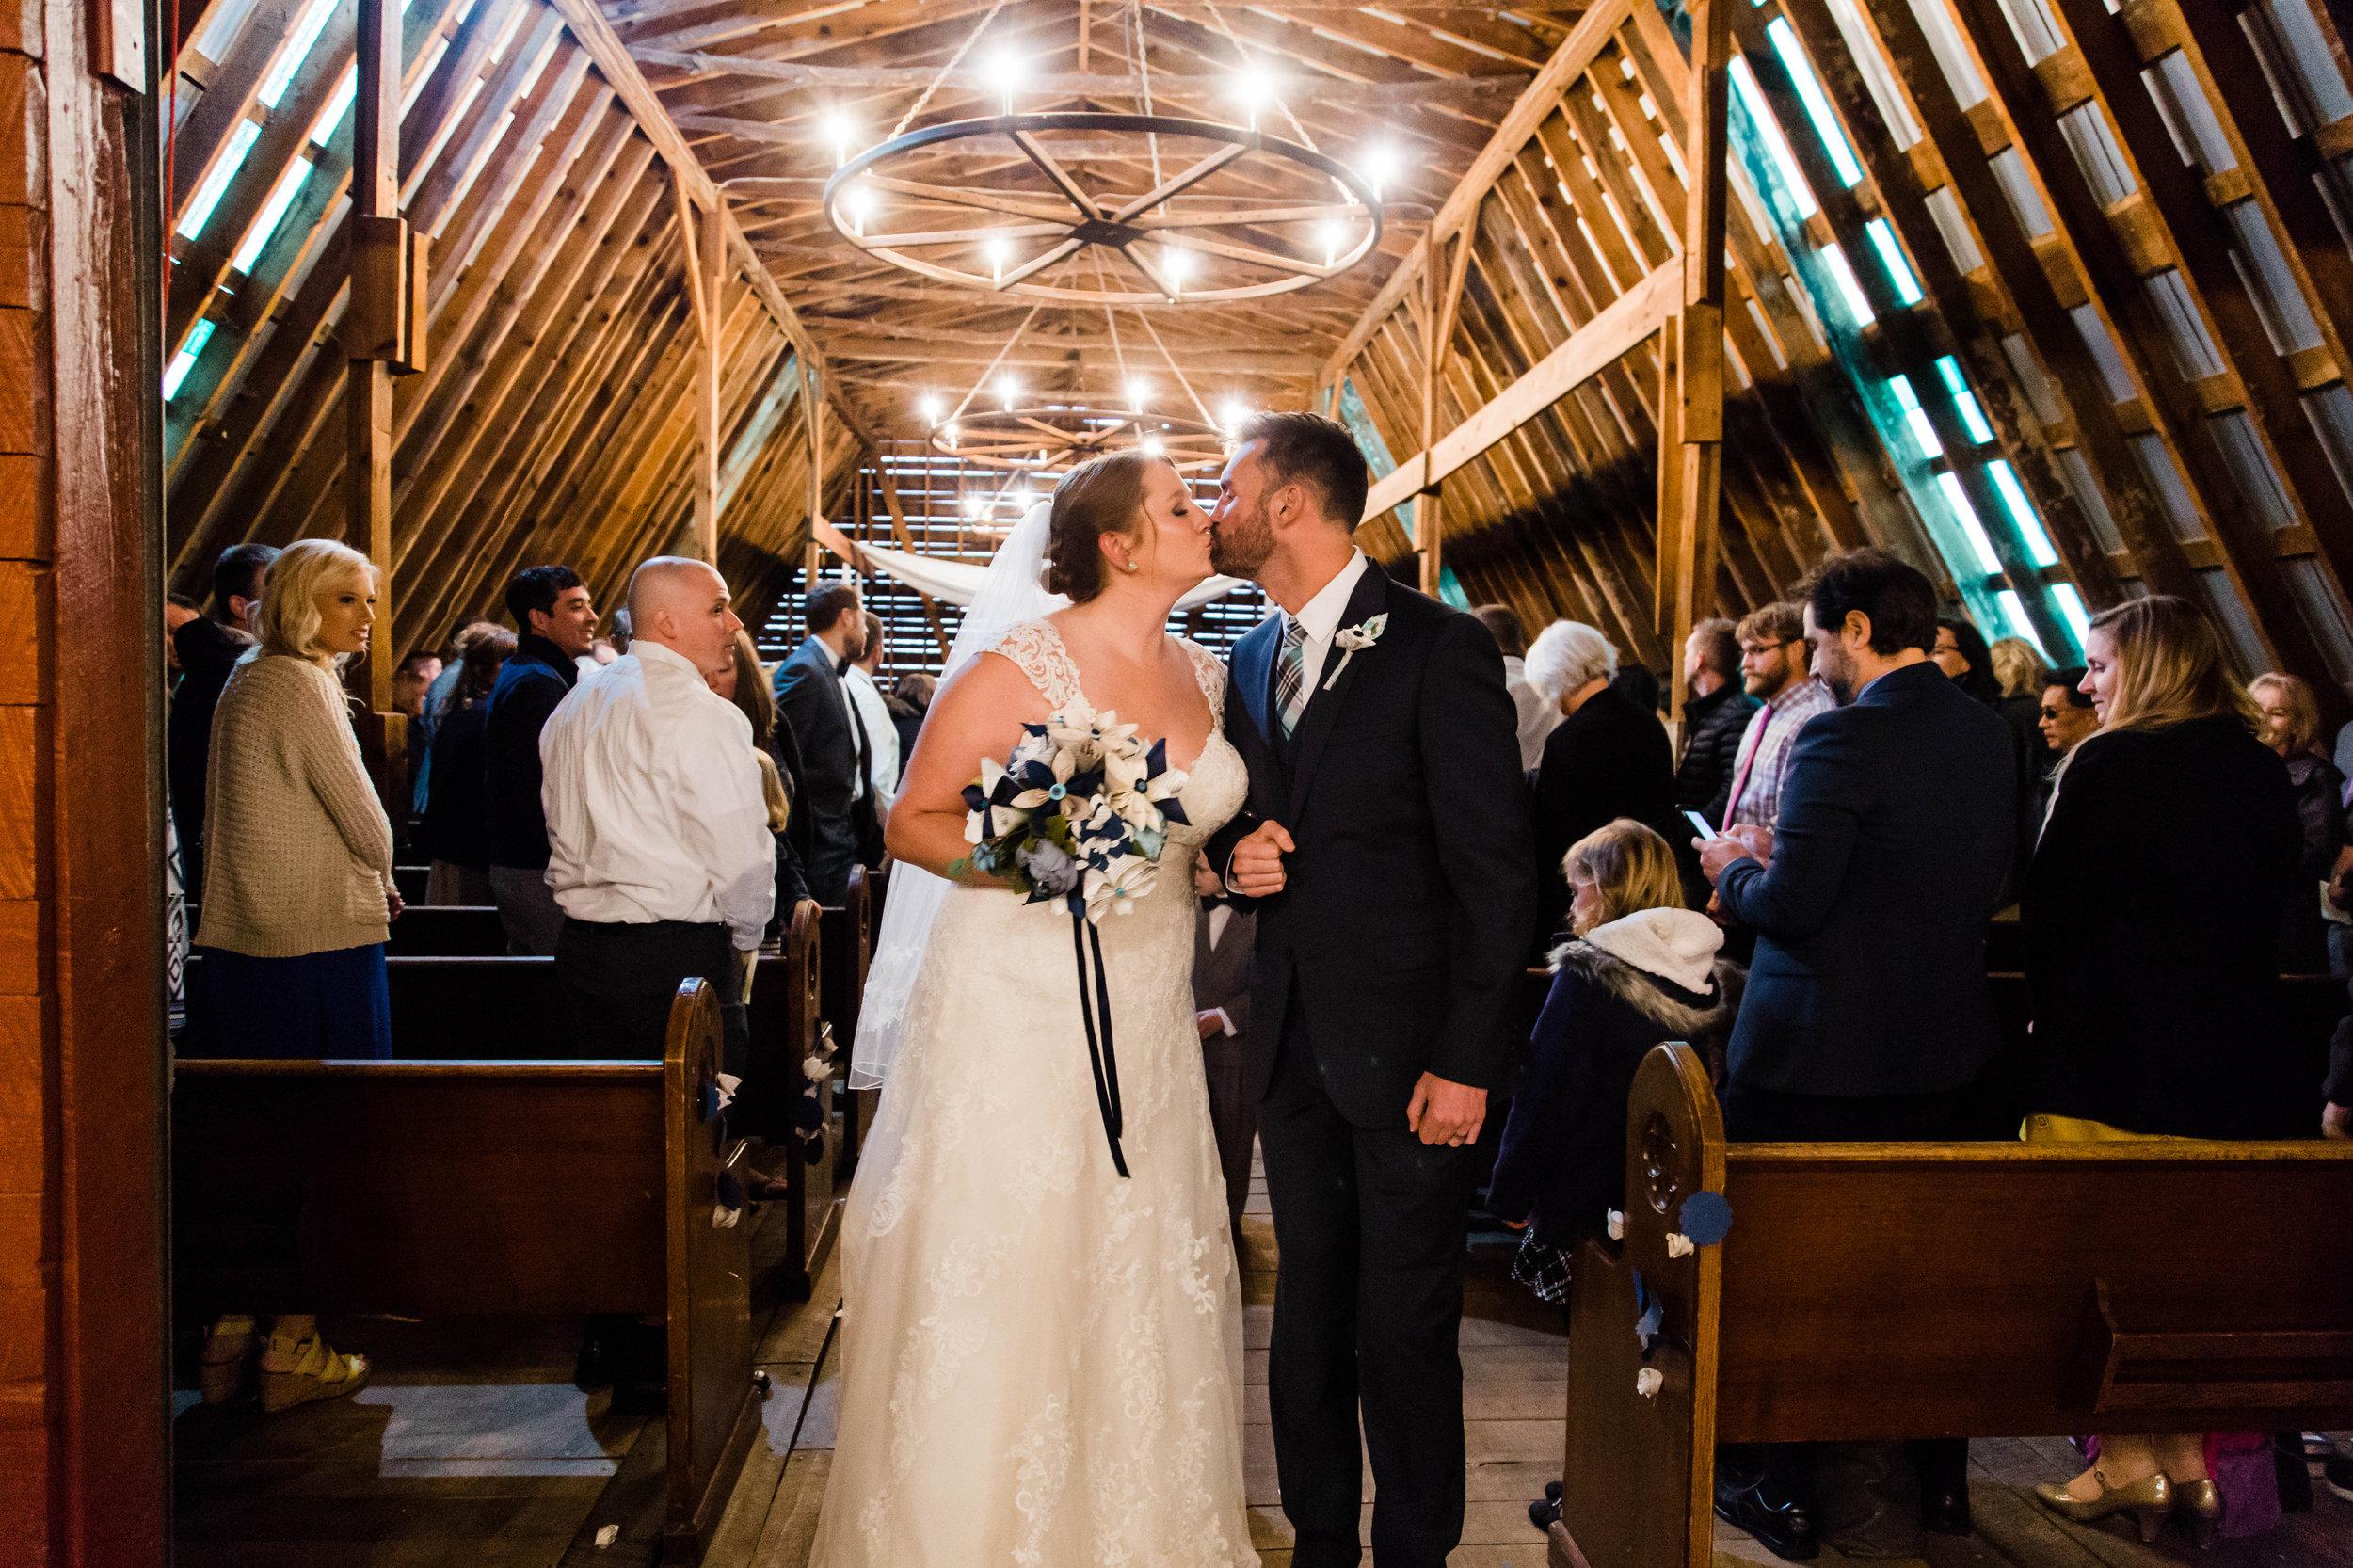 Honeysuckle-Hill-Weddings-Andrew-Rachel-201.jpg